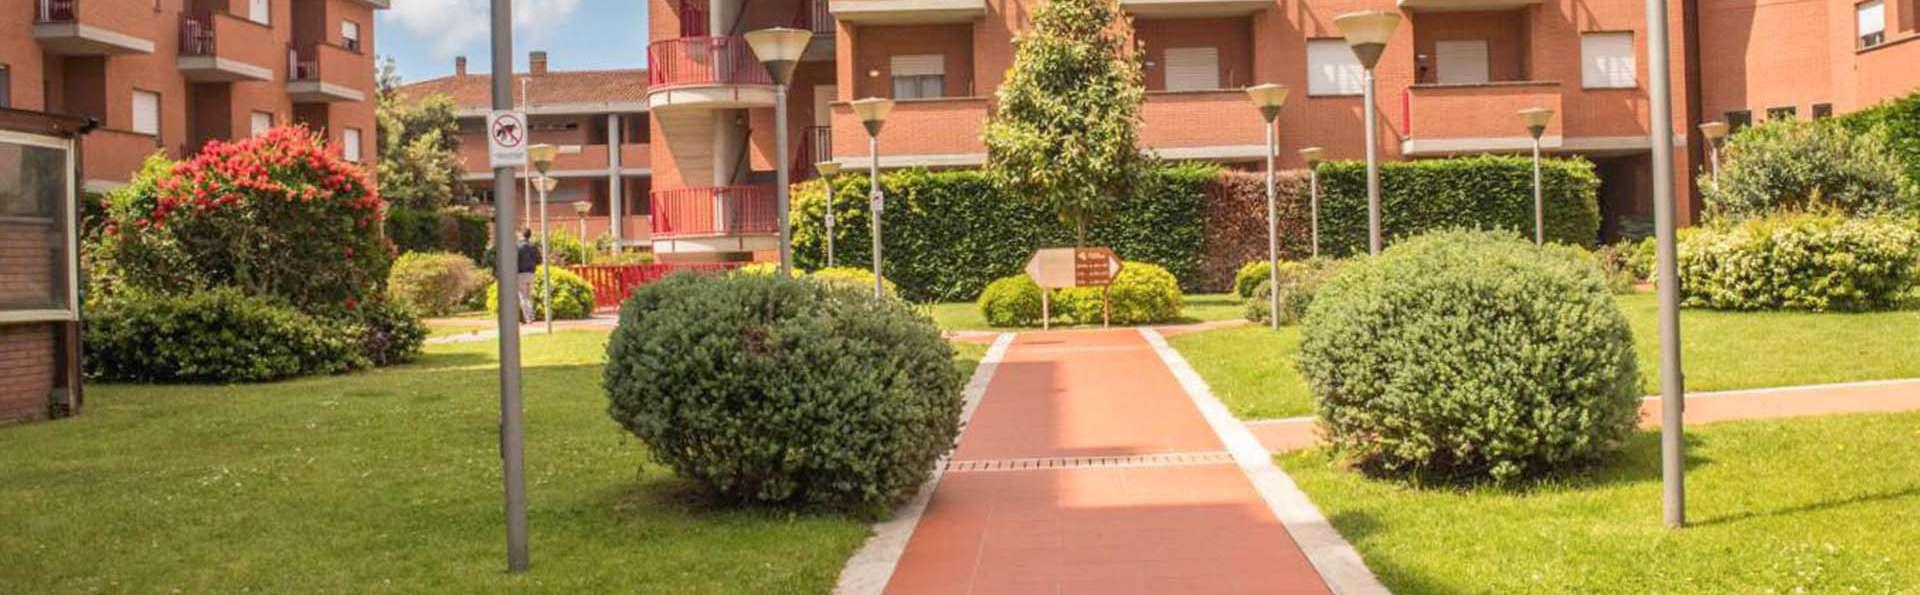 Residence I Triangoli - EDIT_EXTERIOR_04.jpg